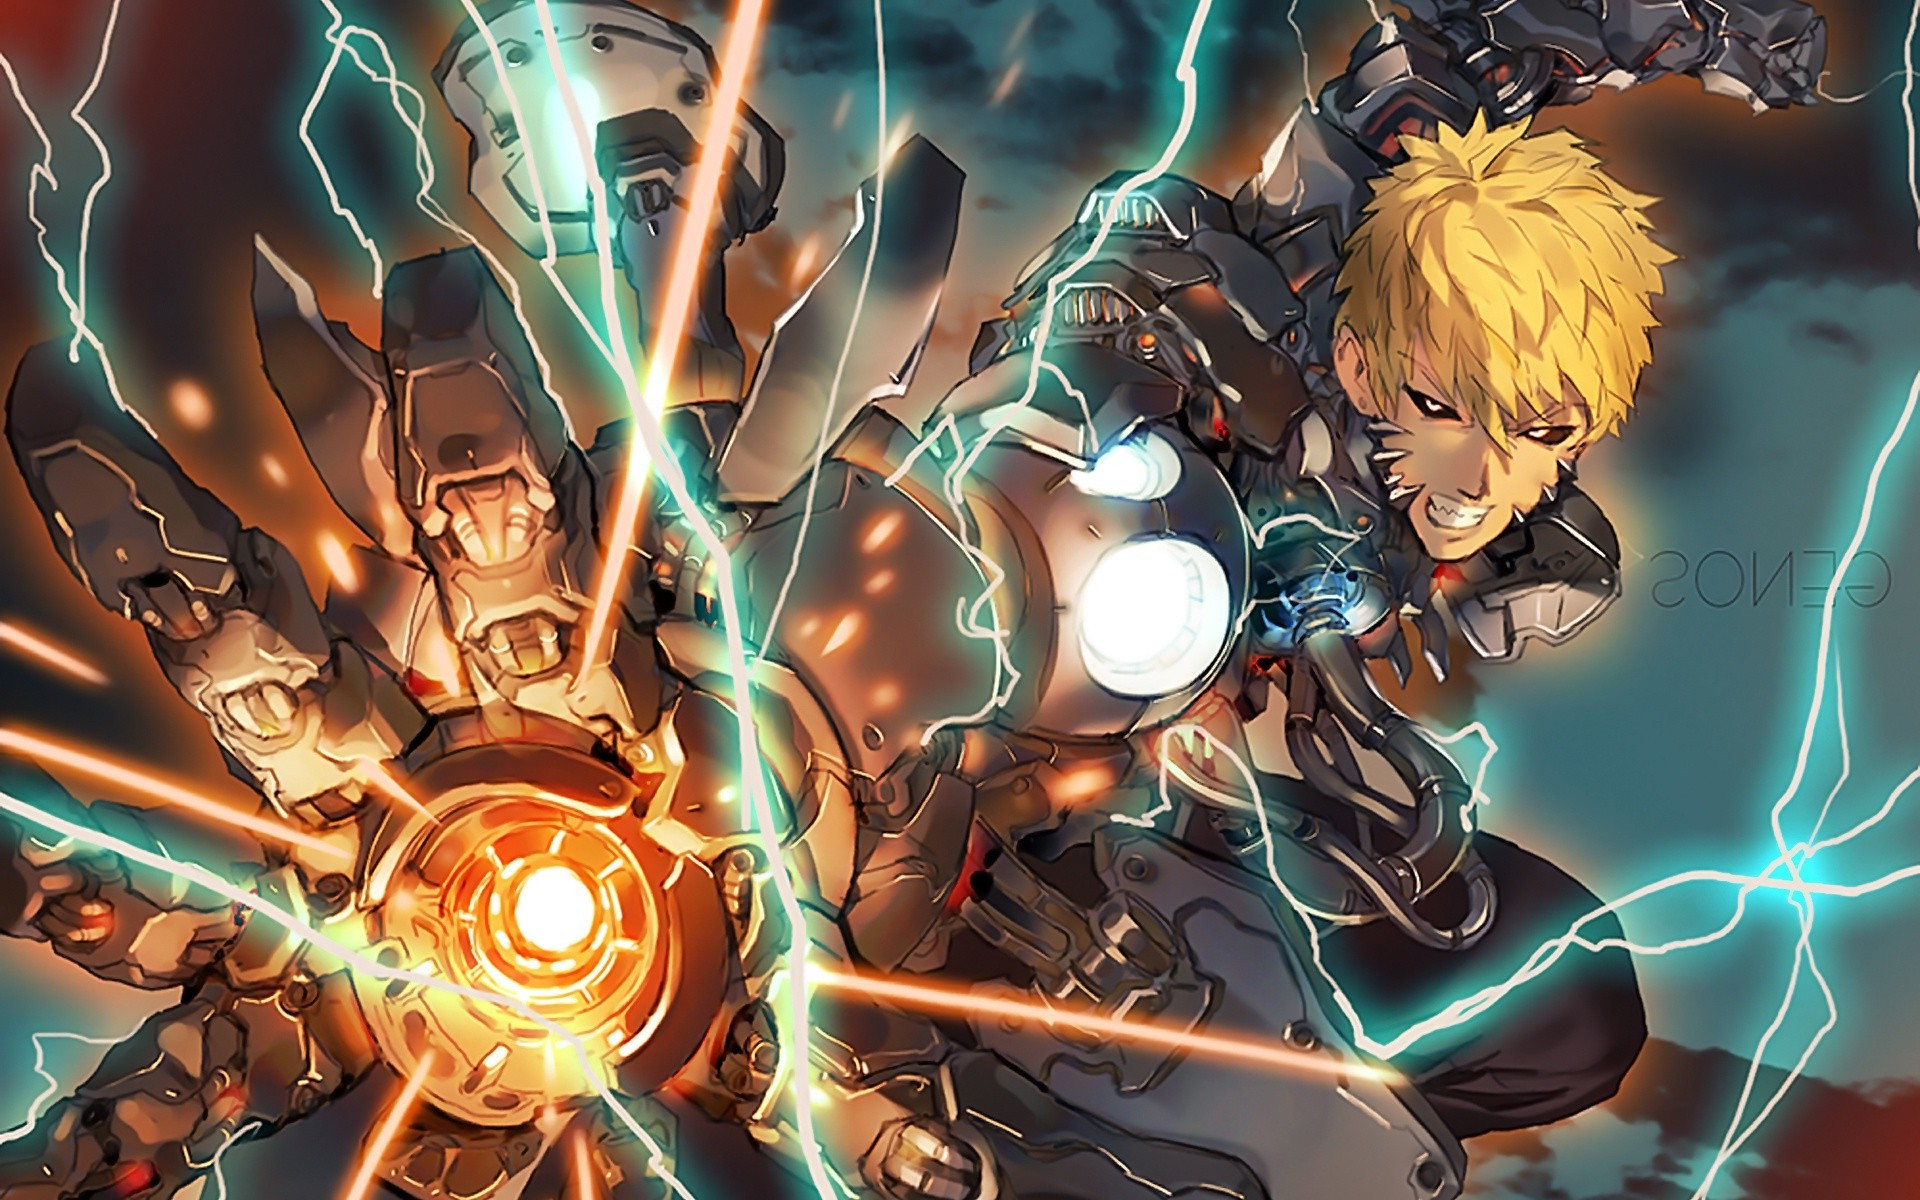 Hisoka Iphone Wallpaper One Punch Man Genos Lightning Cyborg Wallpapers Hd